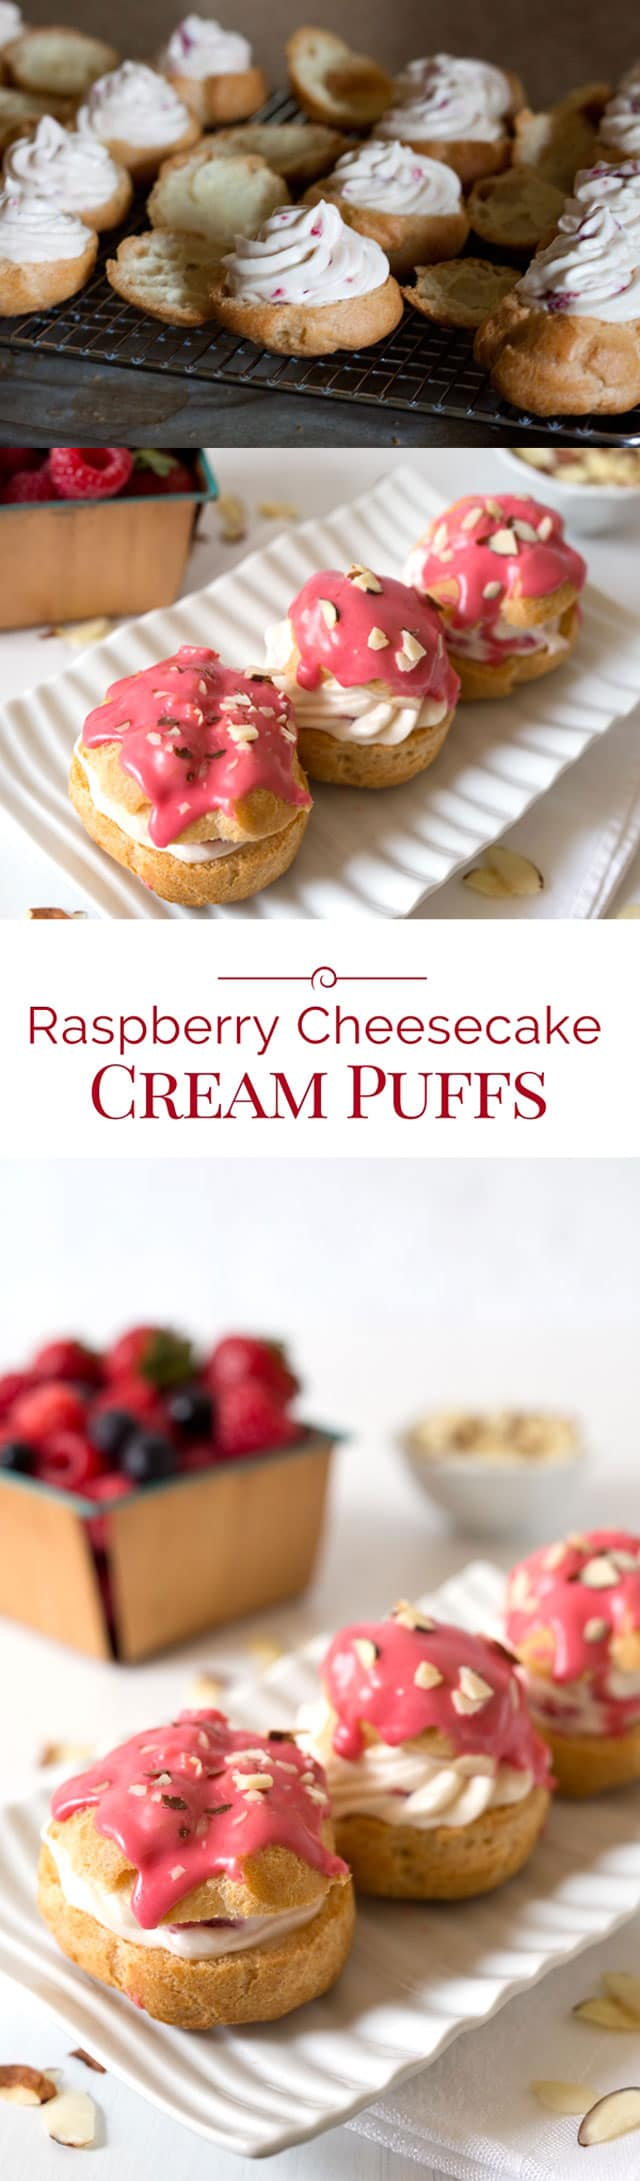 Raspberry-Cheesecake-Cream-Puffs-Collage-3-Barbara-Bakes